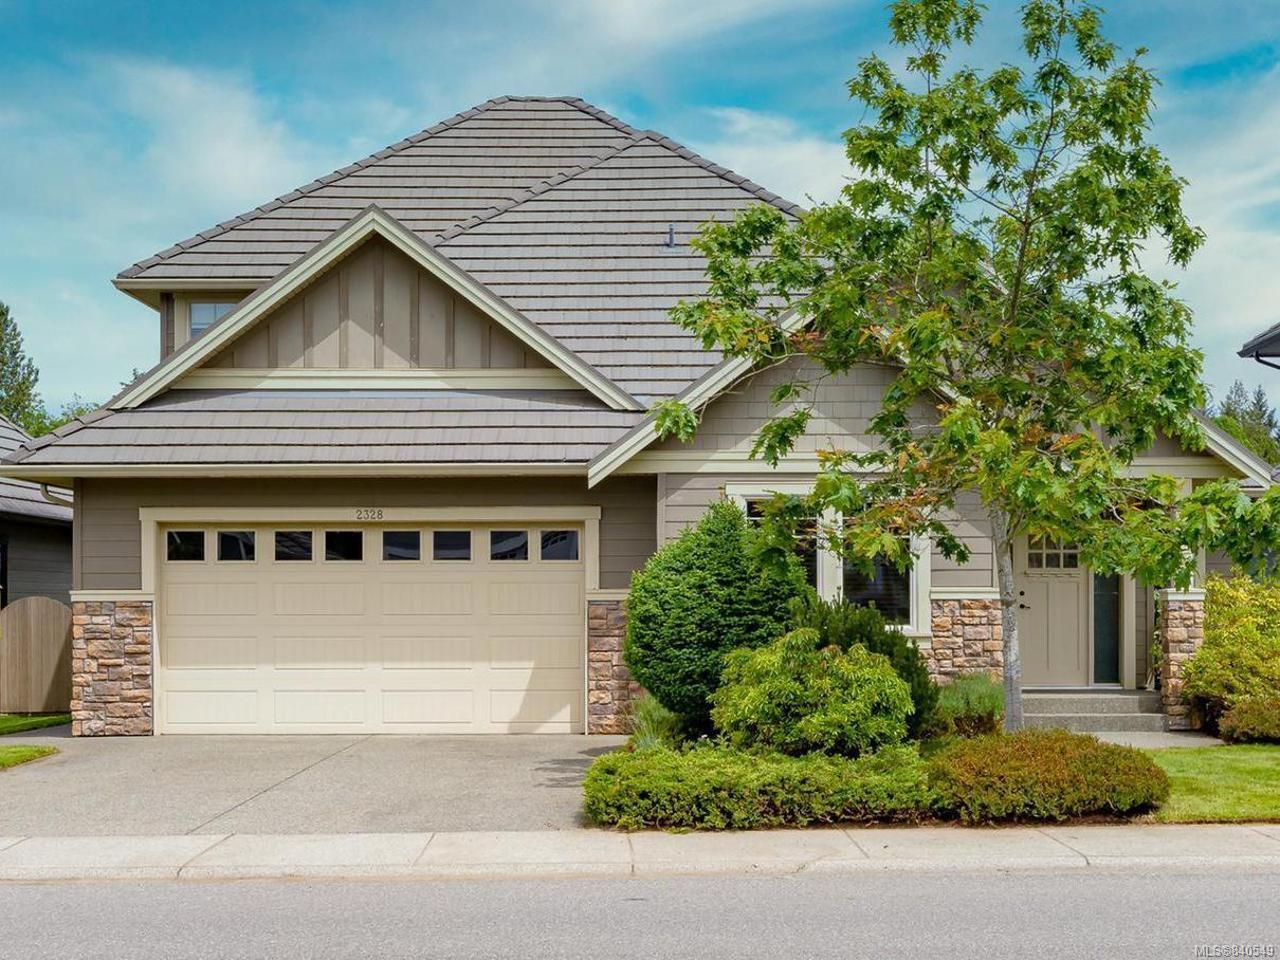 Main Photo: 2328 Idiens Way in COURTENAY: CV Crown Isle House for sale (Comox Valley)  : MLS®# 840549